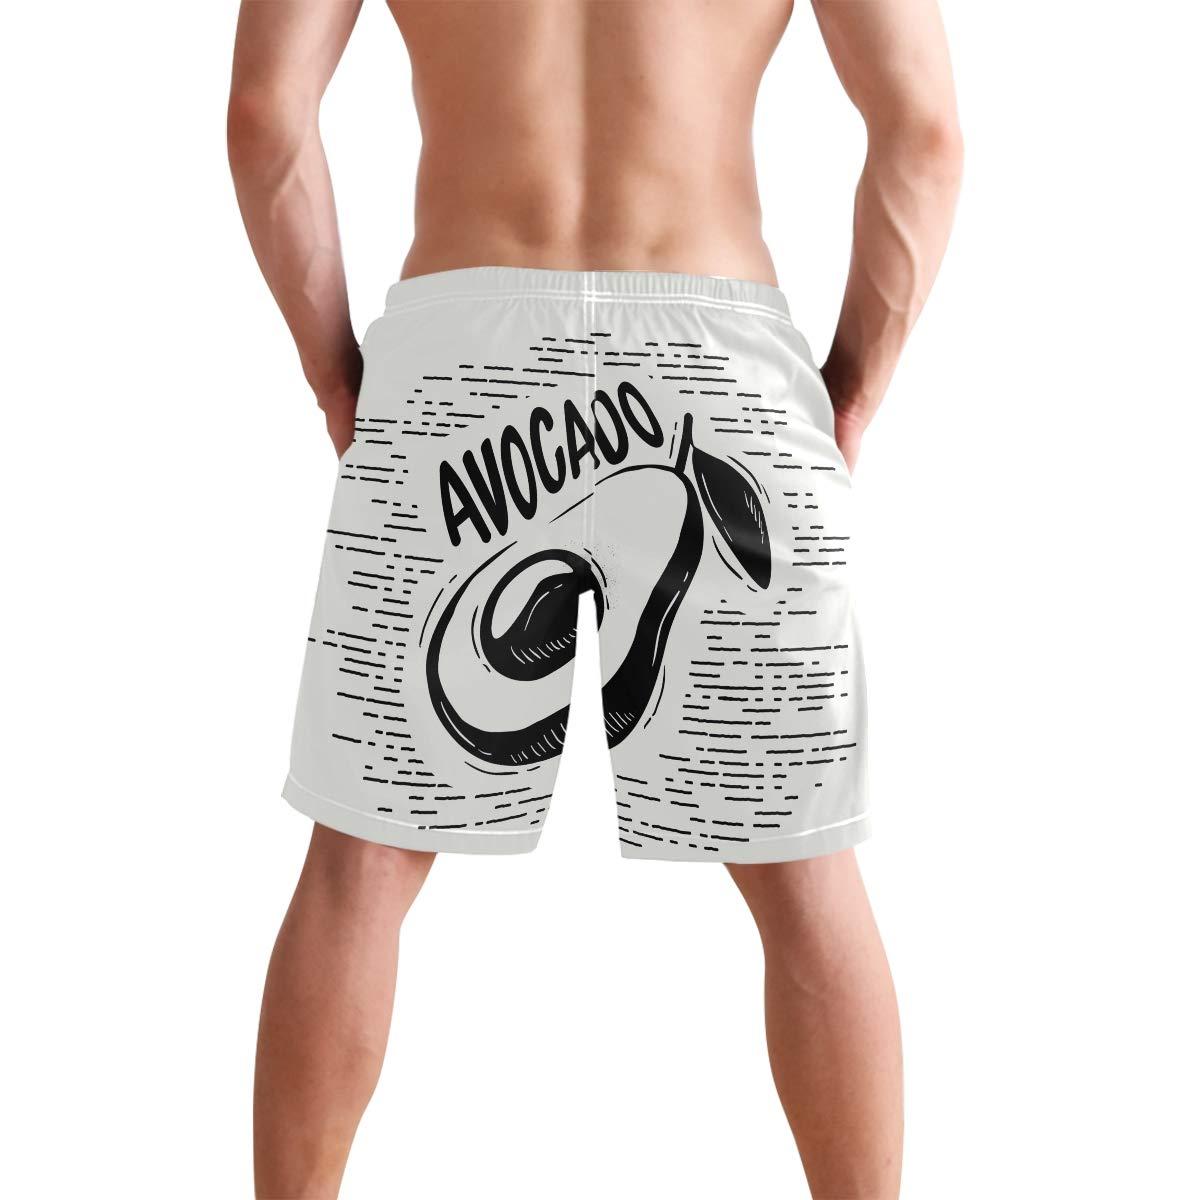 JERECY Mens Swim Trunks Retro Fruit Avocado Quick Dry Board Shorts with Drawstring and Pockets